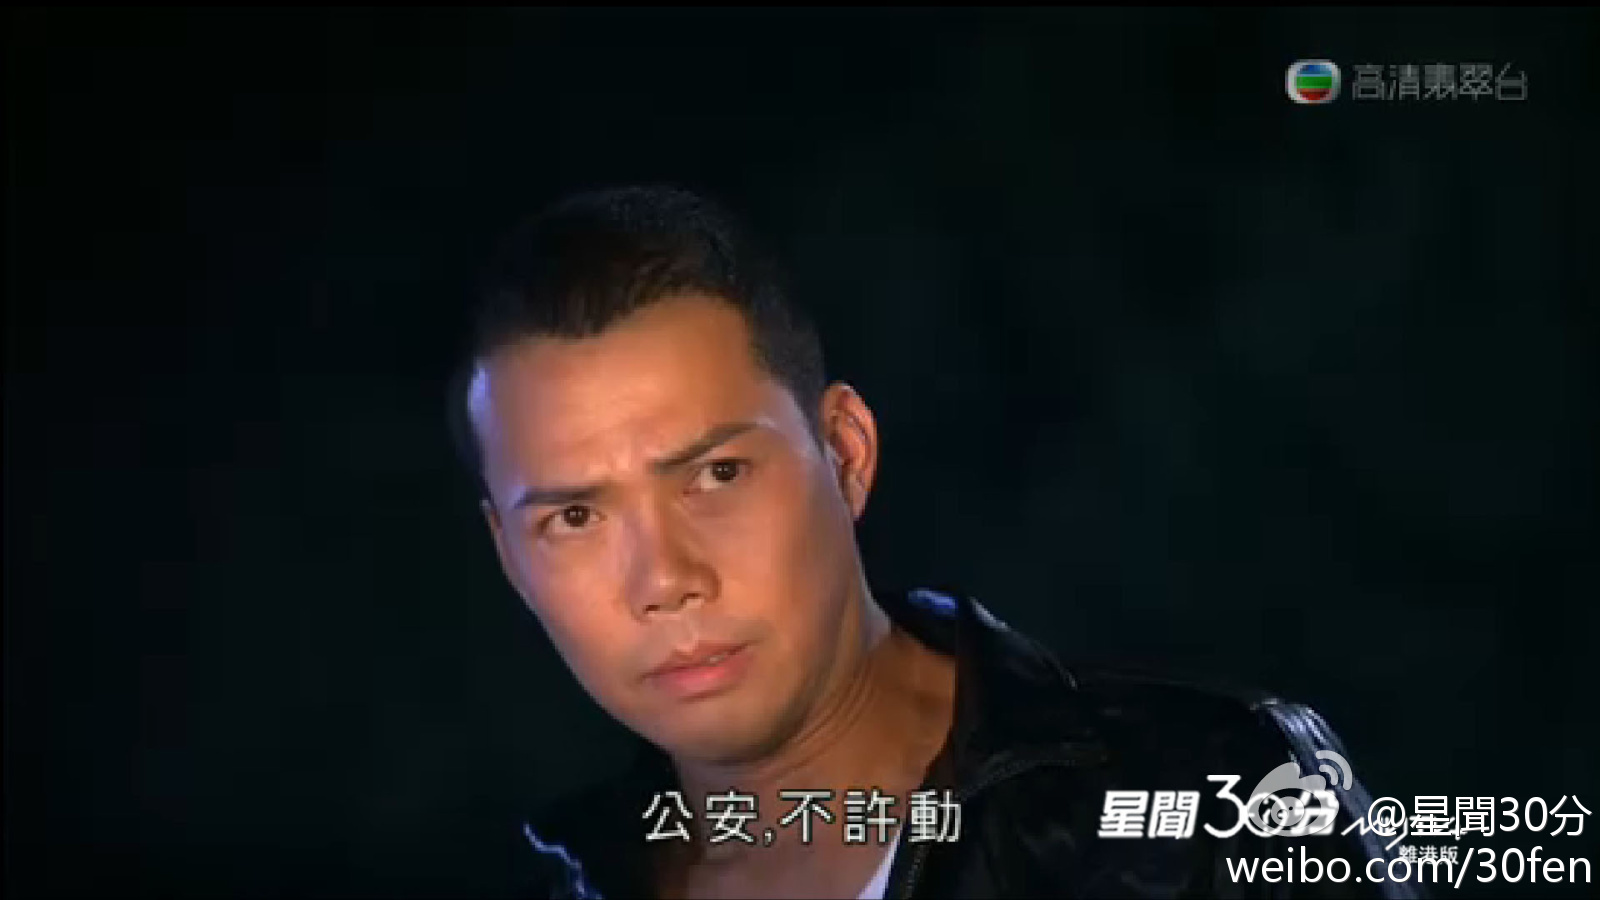 tvb高清翡翠台下载_MyTV离港版_360百科